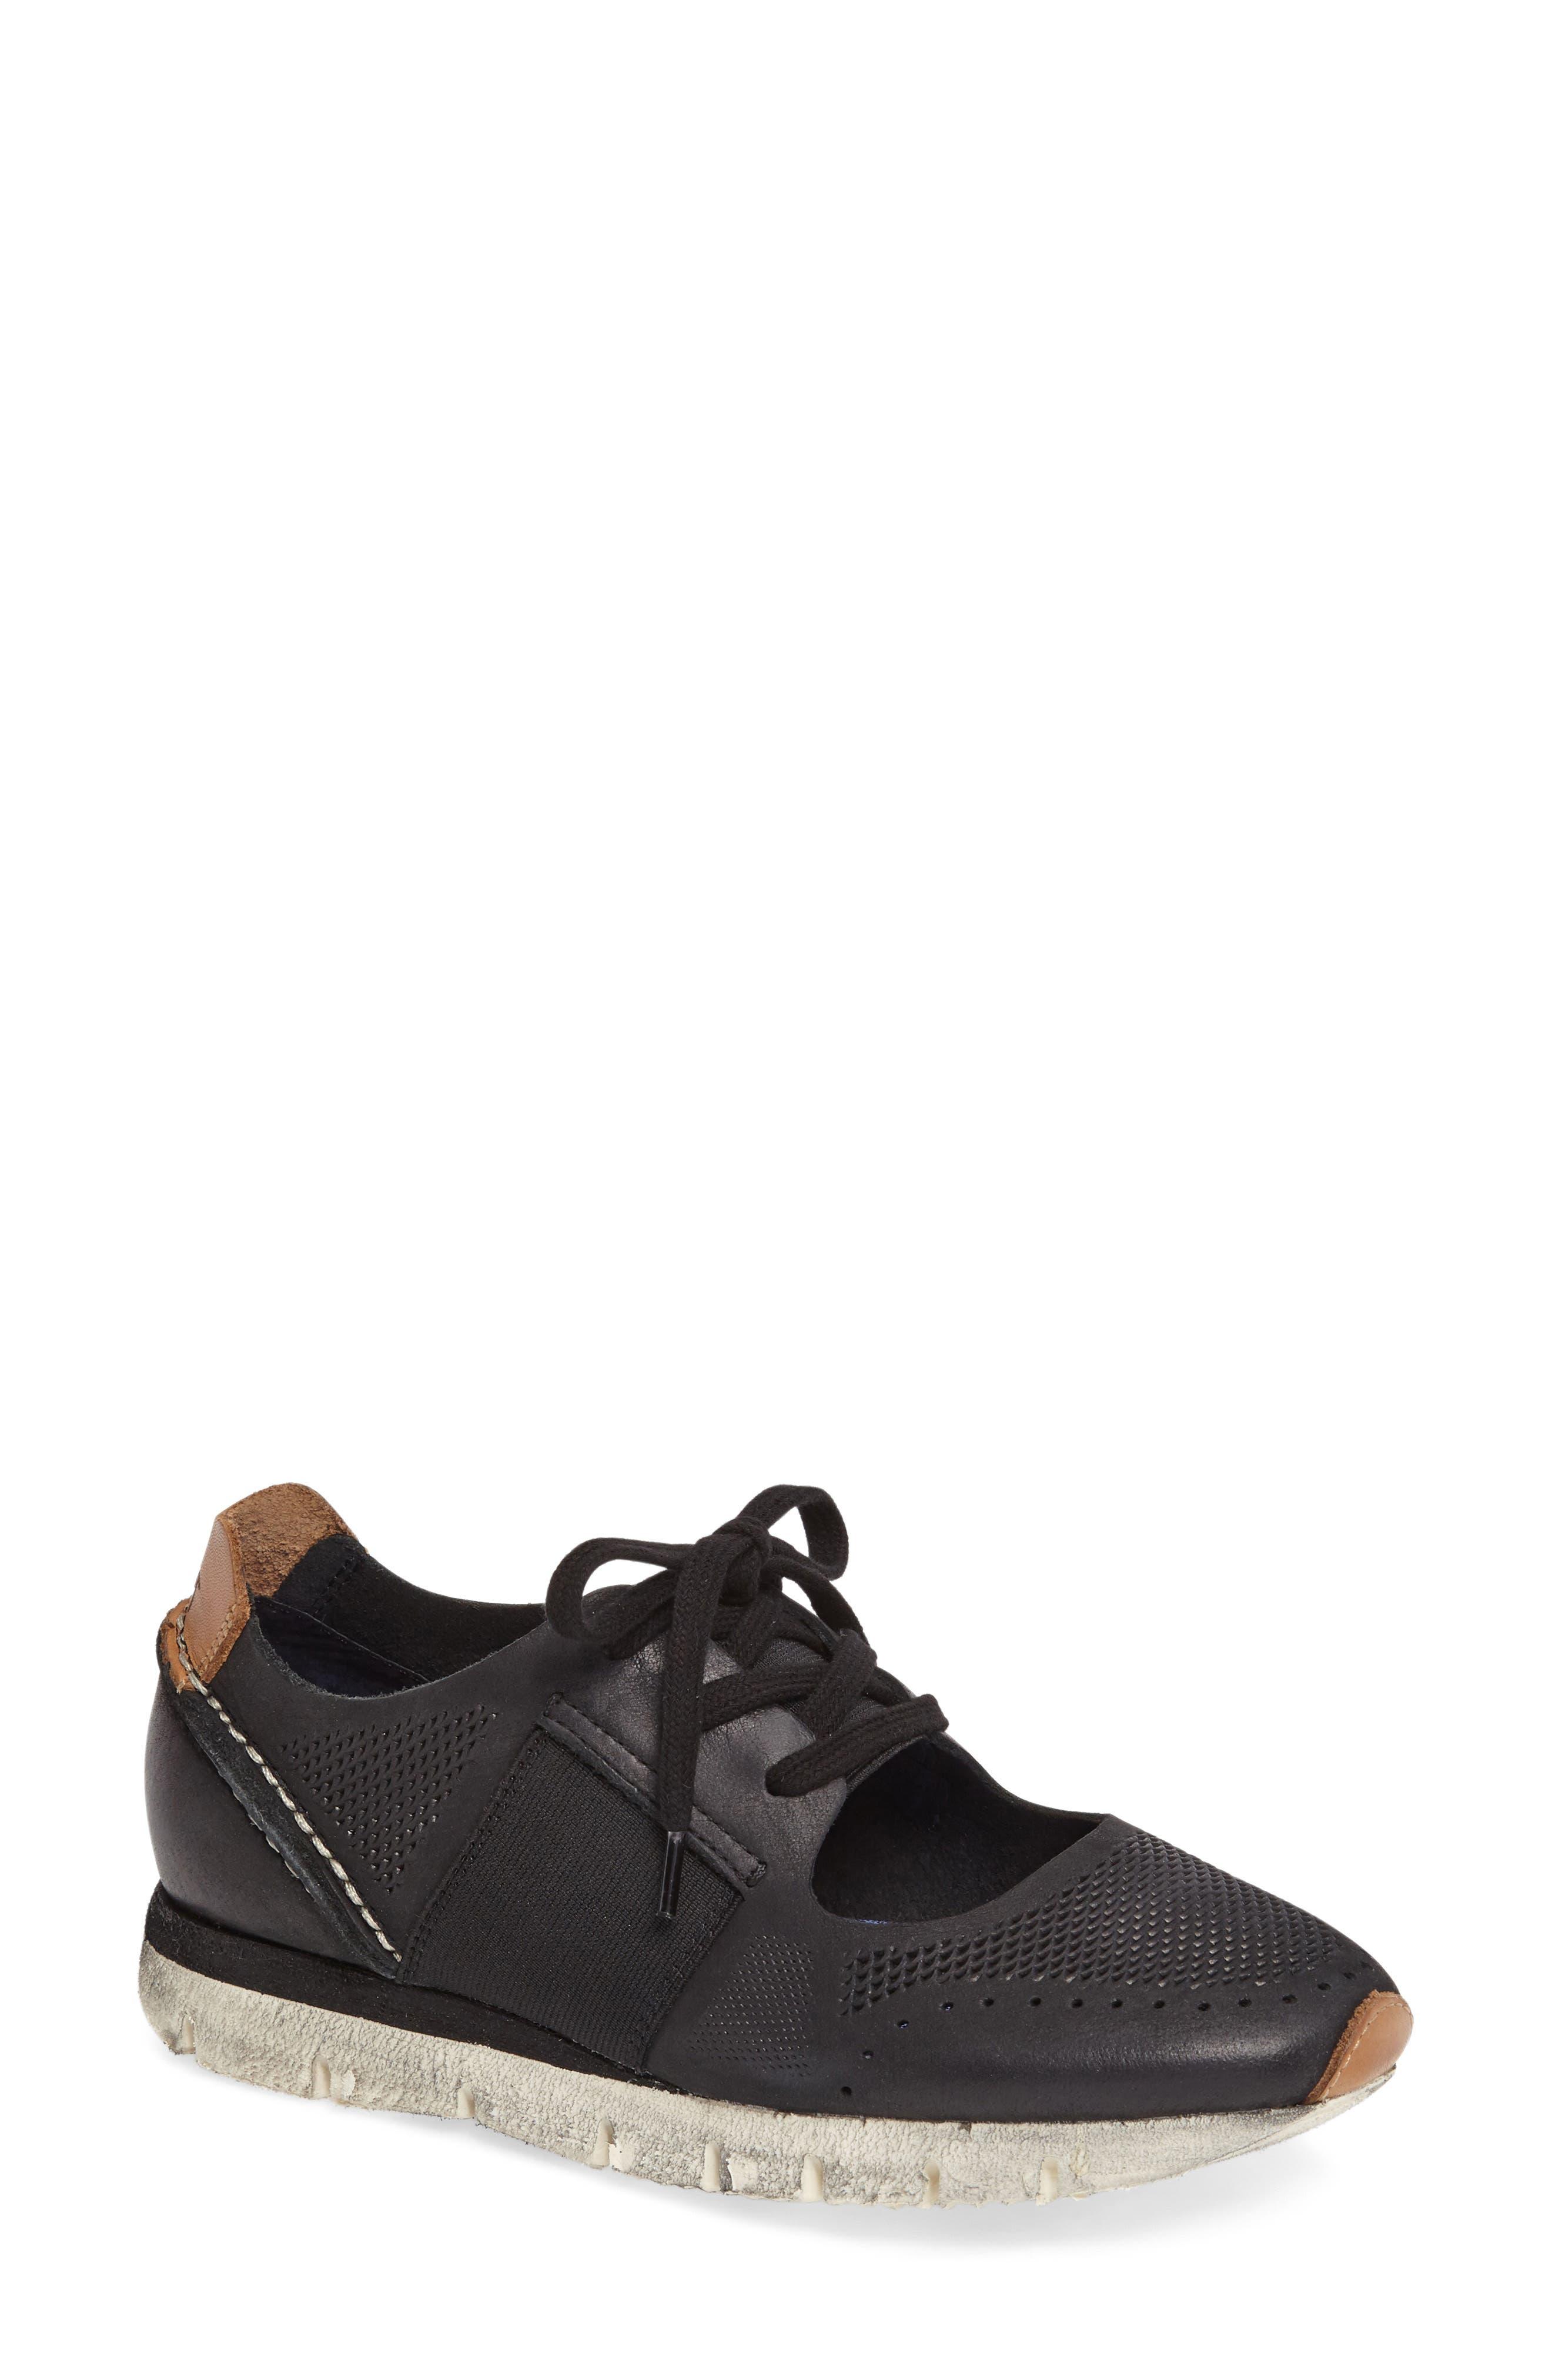 Star Dust Cutout Sneaker,                             Main thumbnail 1, color,                             BLACK LEATHER